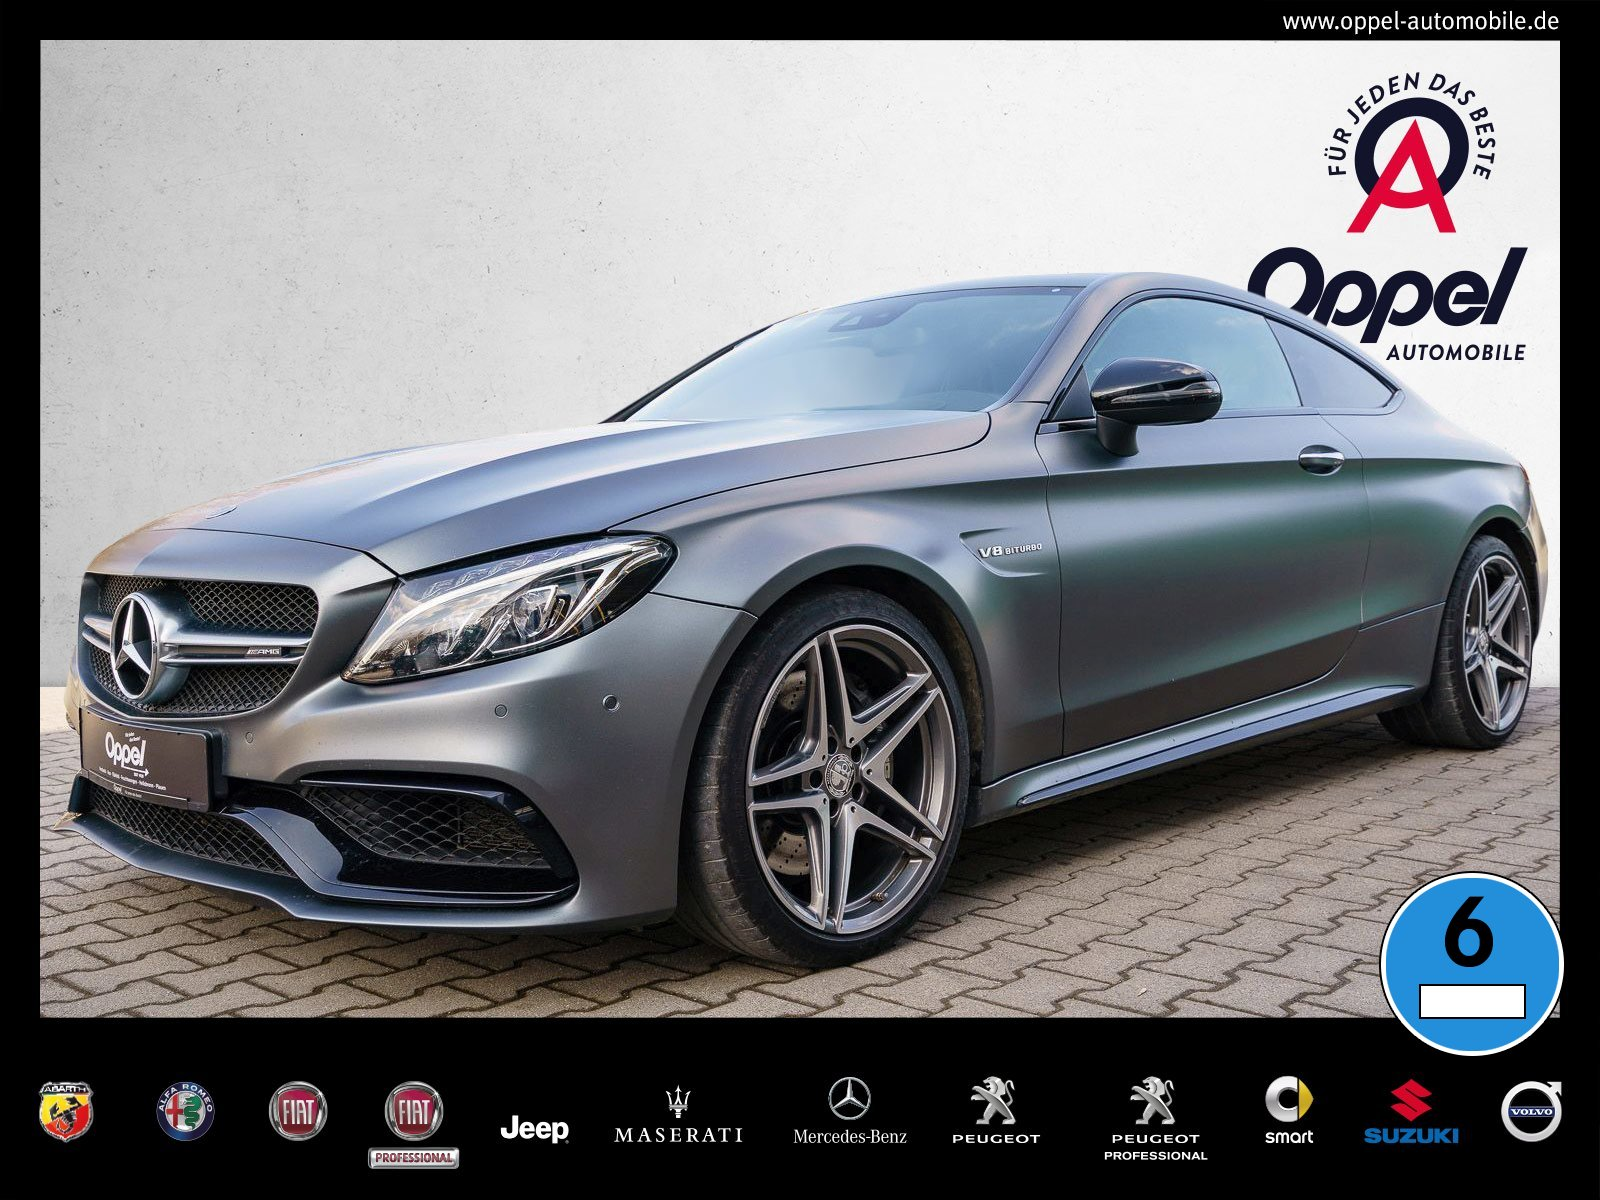 Mercedes-Benz C 63 AMG +AMG DRIVERŽS PACK+NAVI+PANORAMA+KAMERA, Jahr 2016, Benzin